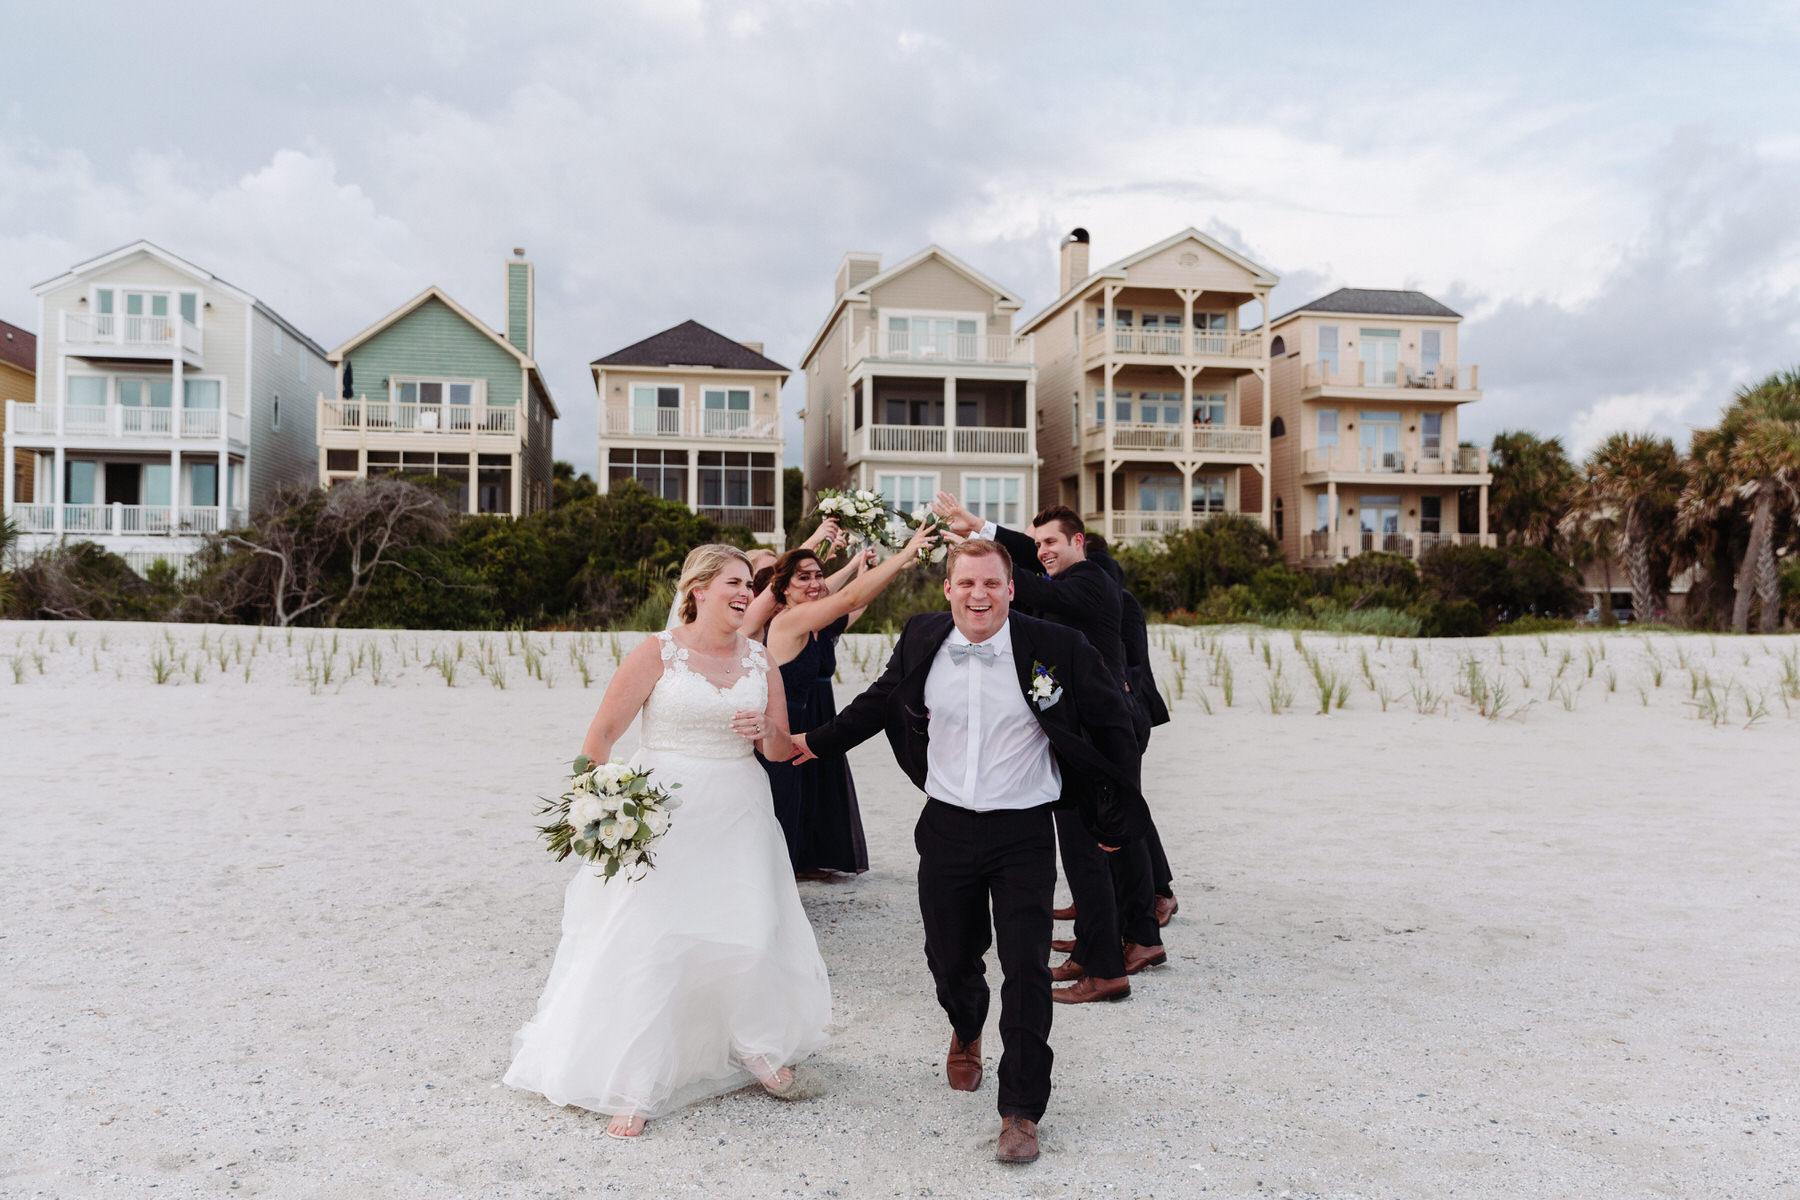 wild-dunes-charleston-isle-of-palms-IOP-wedding-828.JPG